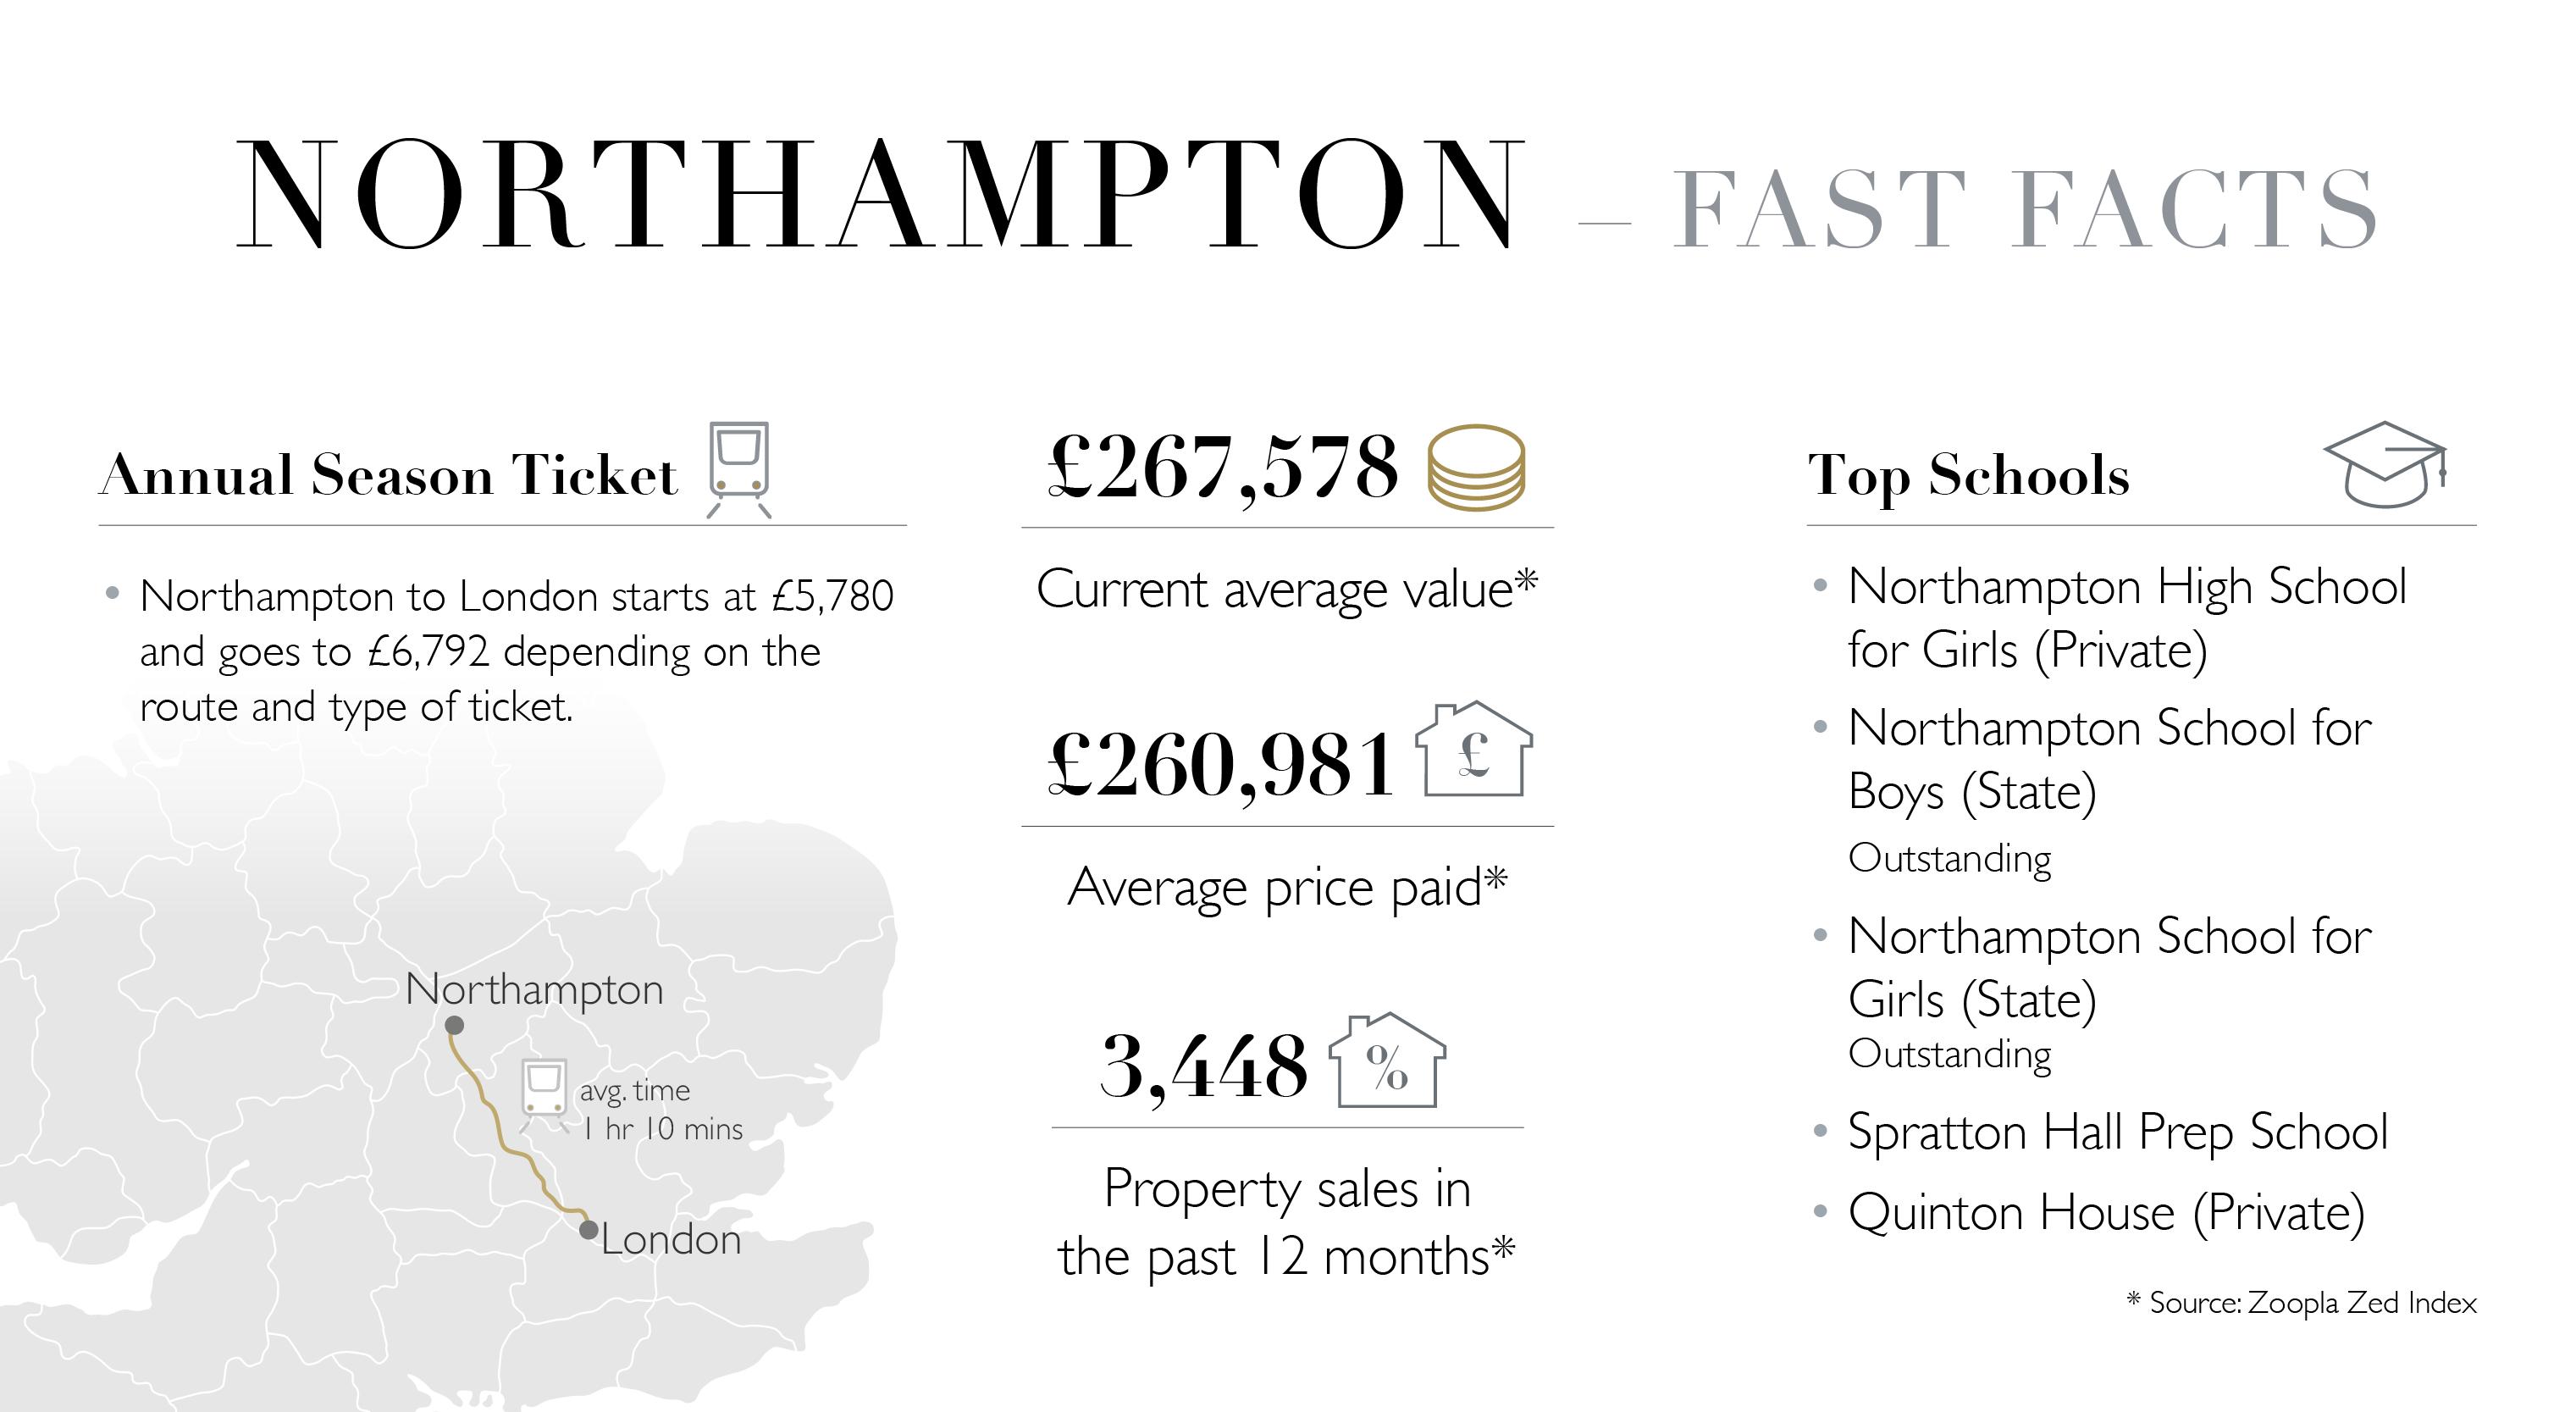 Northampton Fast Facts